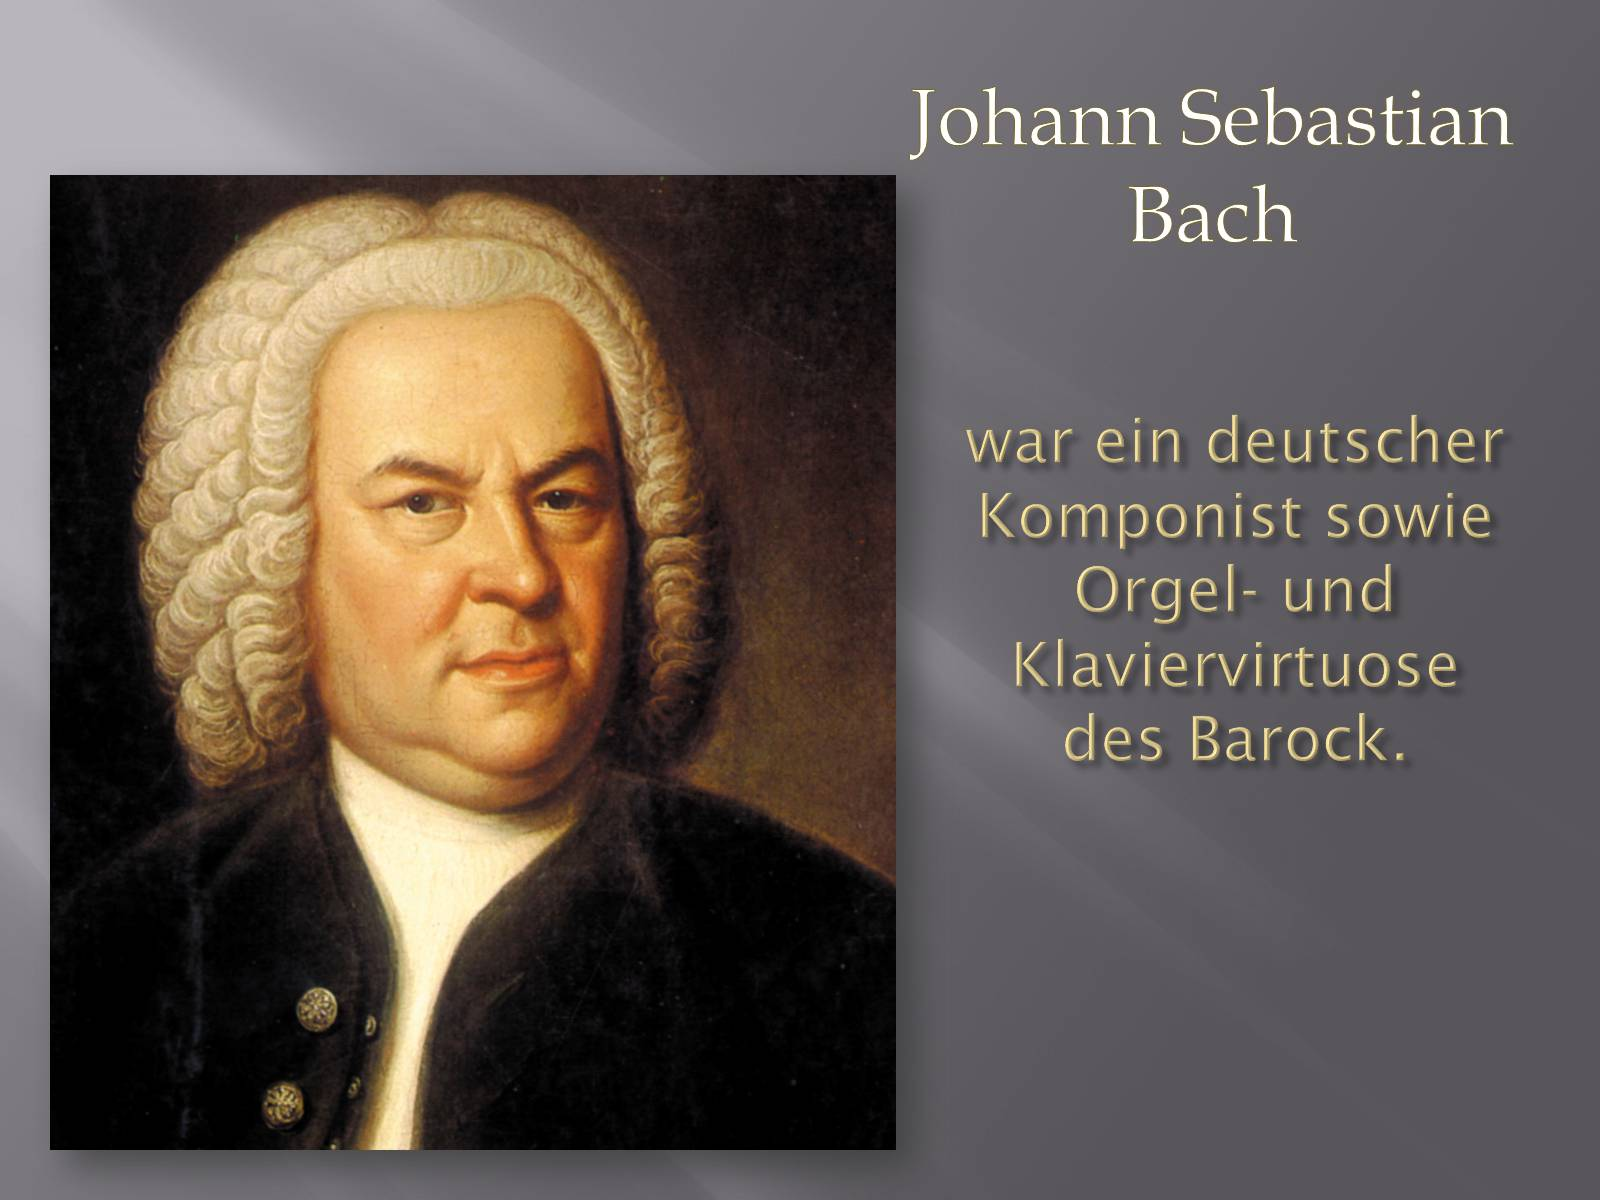 a biography of johann sebastian bach a german composer Johann sebastian bach (march 31, 1685 – july 28, 1750) was a virtuoso german composer, organist, violinist, violist, harpsichordist from the baroque period.